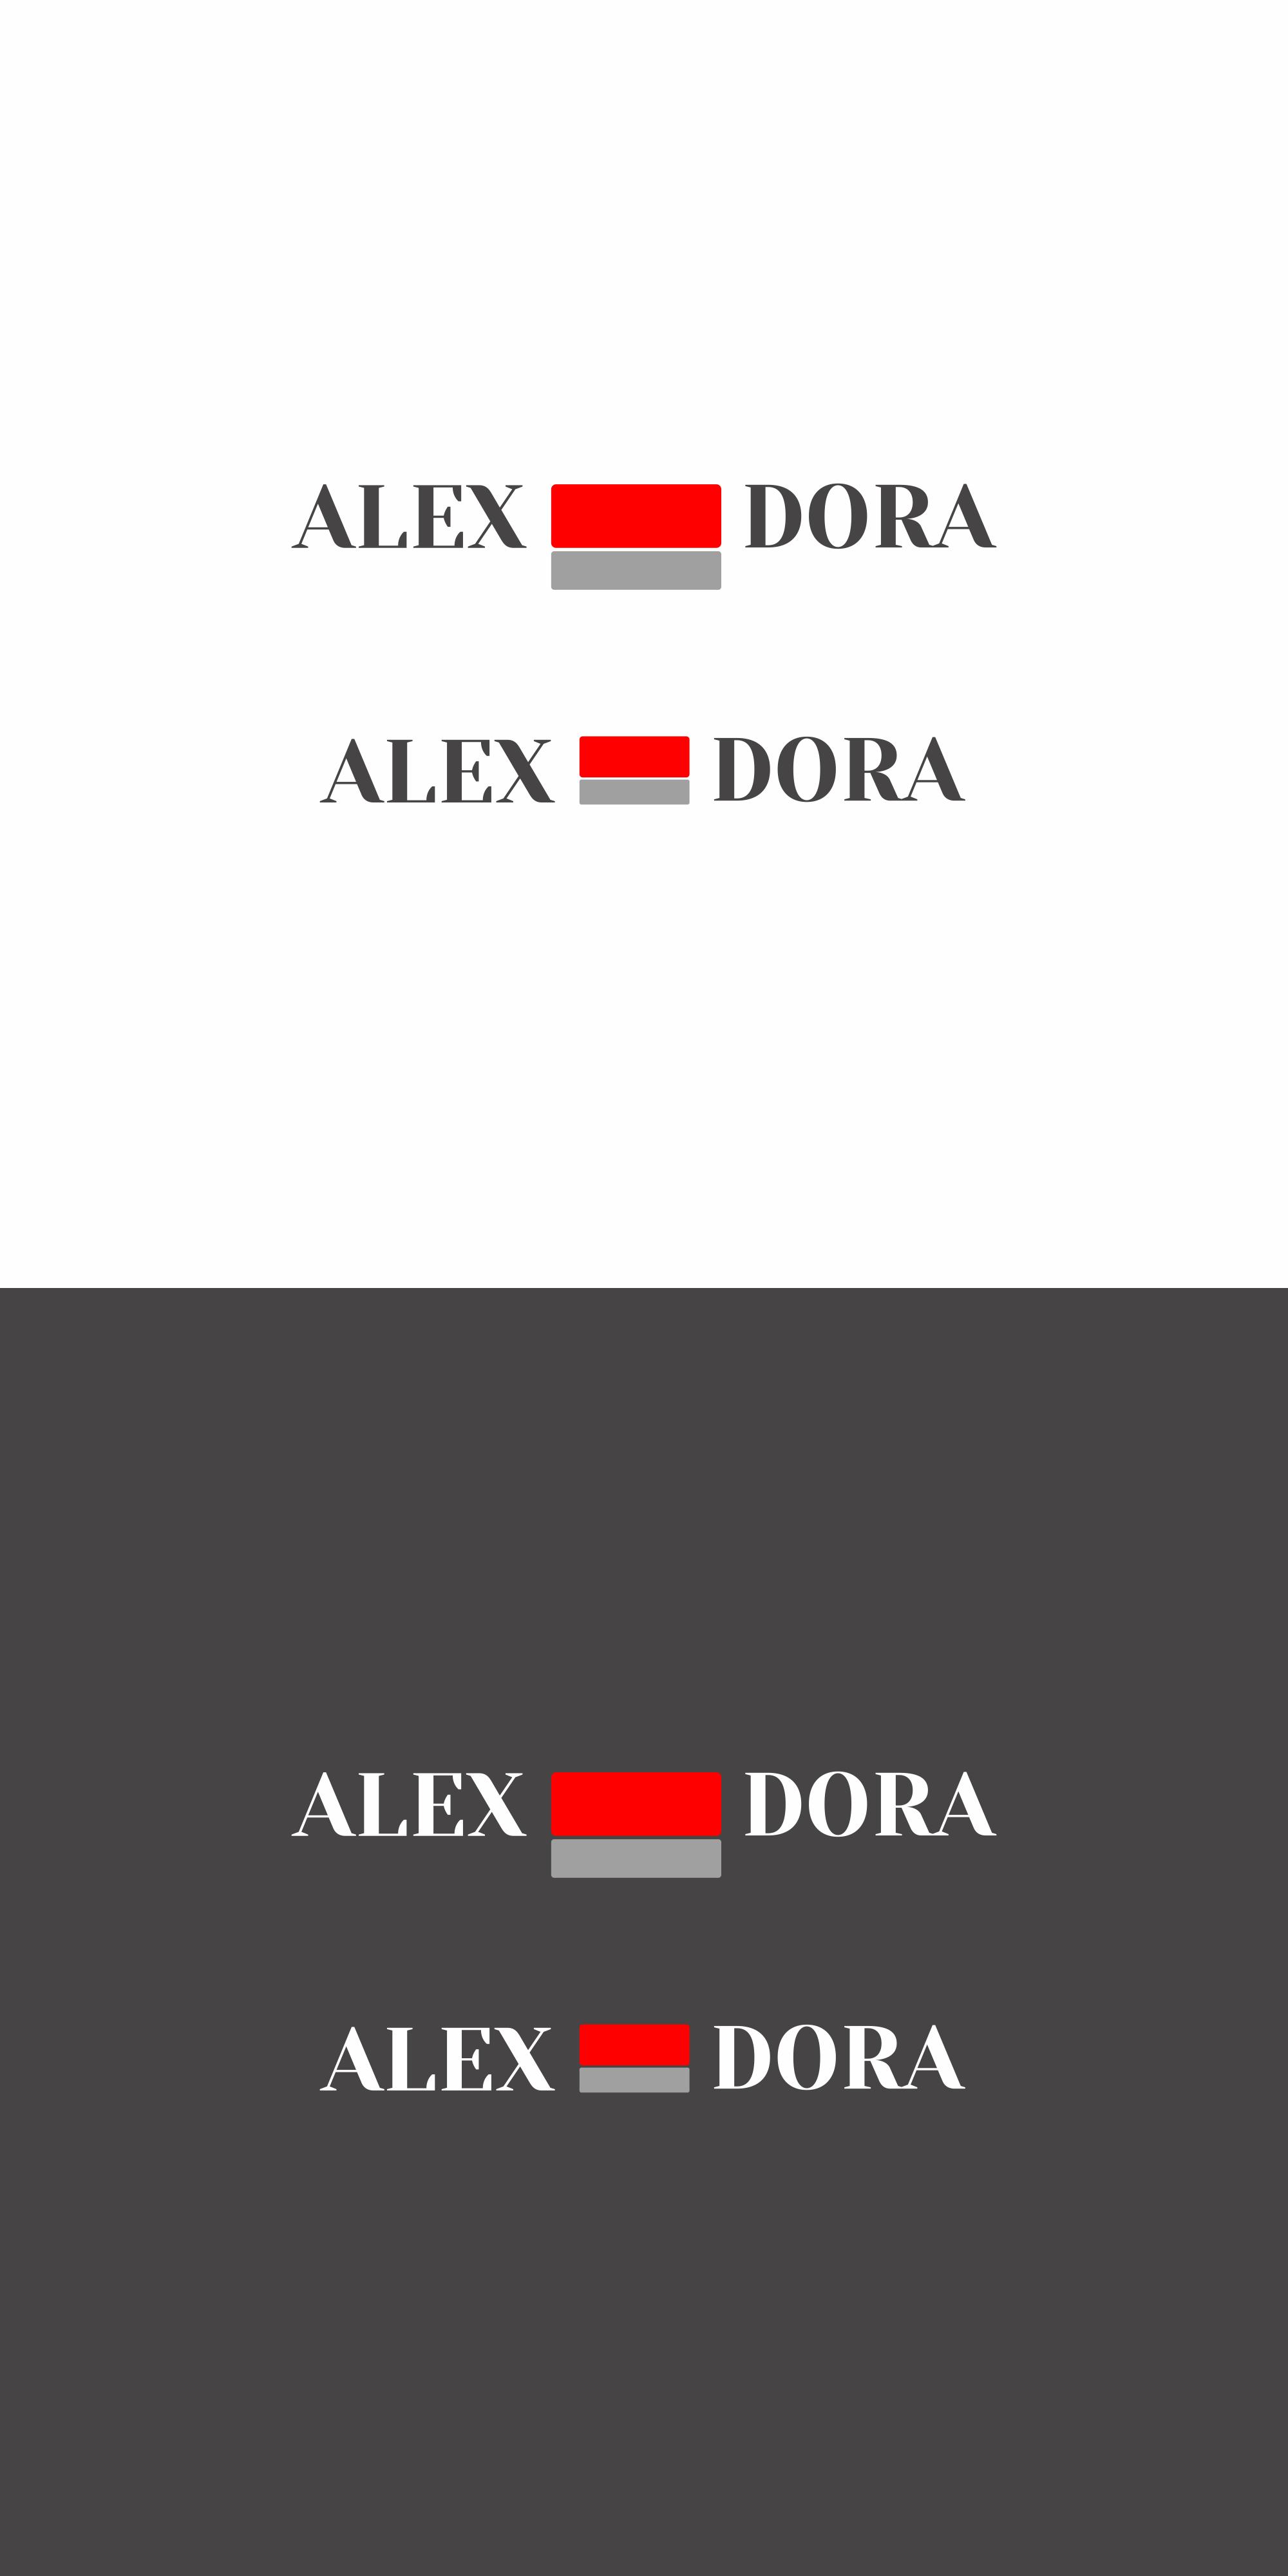 Необходим дизайнер для доработки логотипа бренда одежды фото f_3335b354ab68efd3.jpg